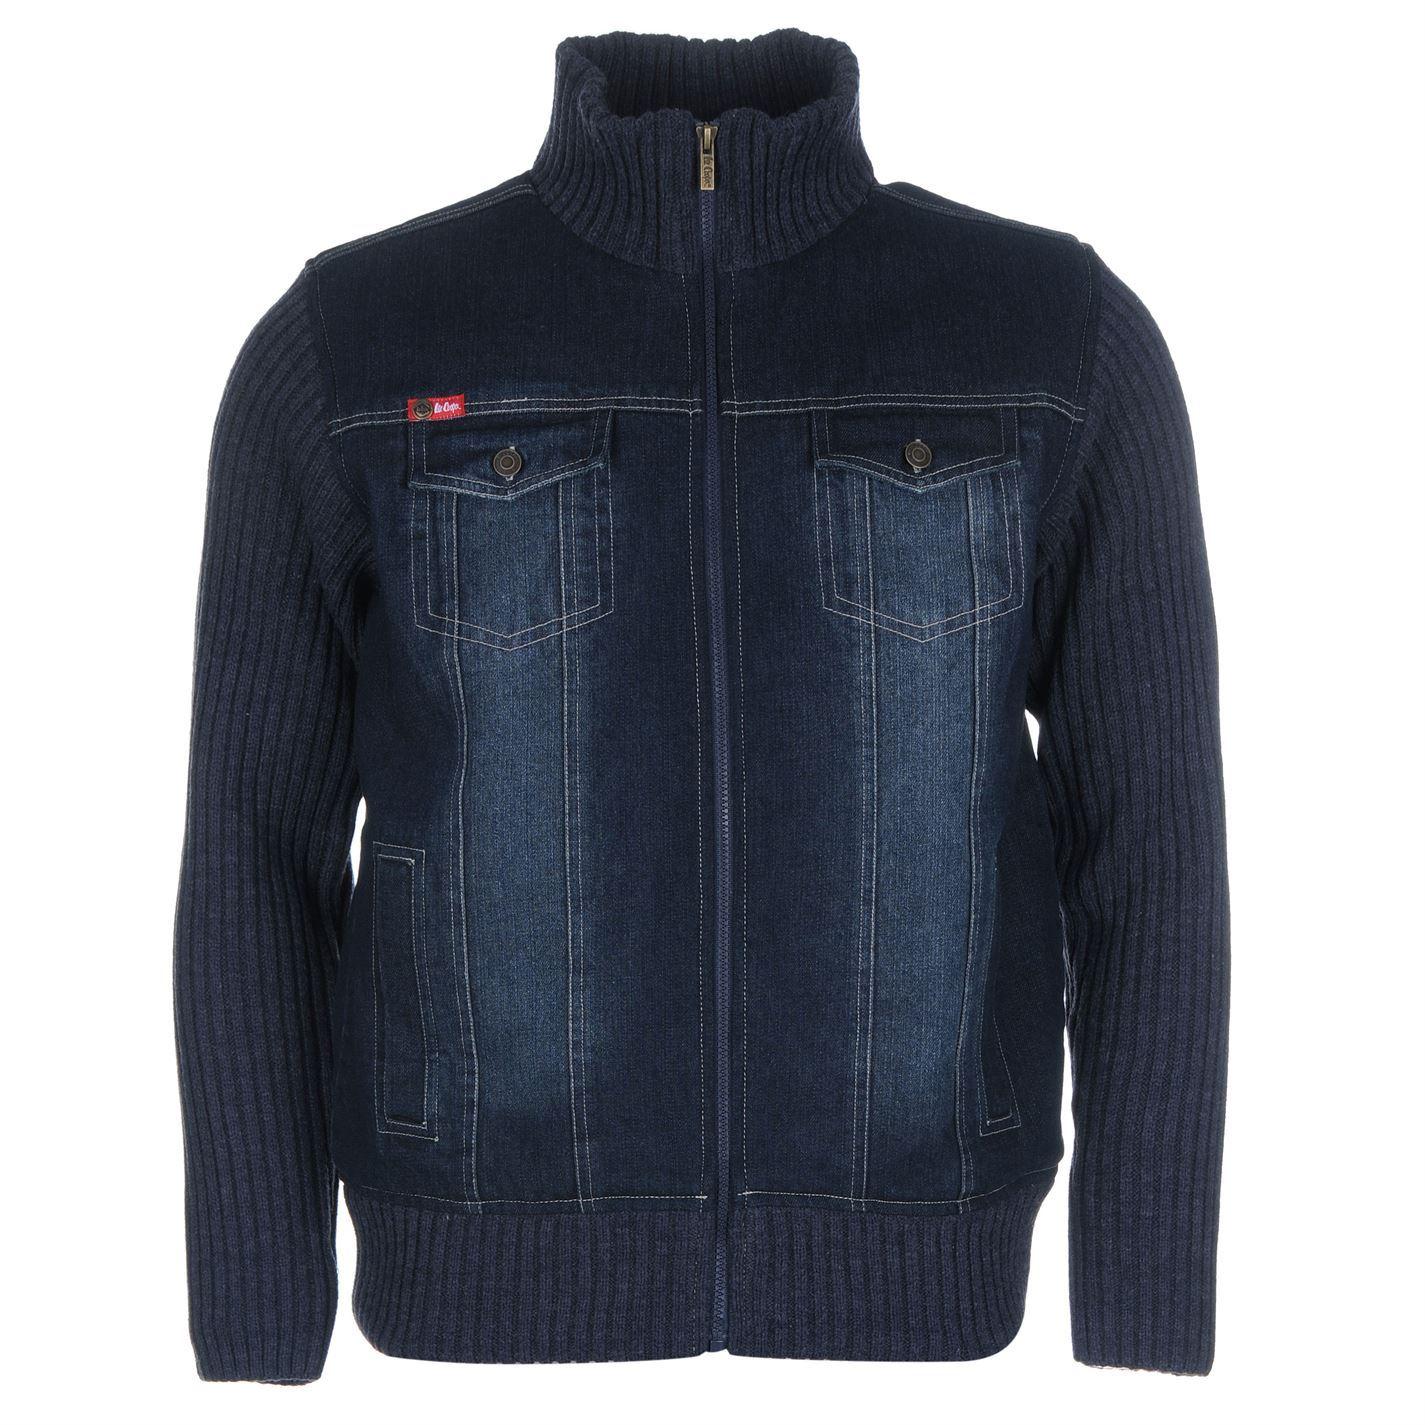 Lee Cooper Mens Lined Knit Denim Jackets Long Sleeve Zip Fastening Coat Tops | eBay